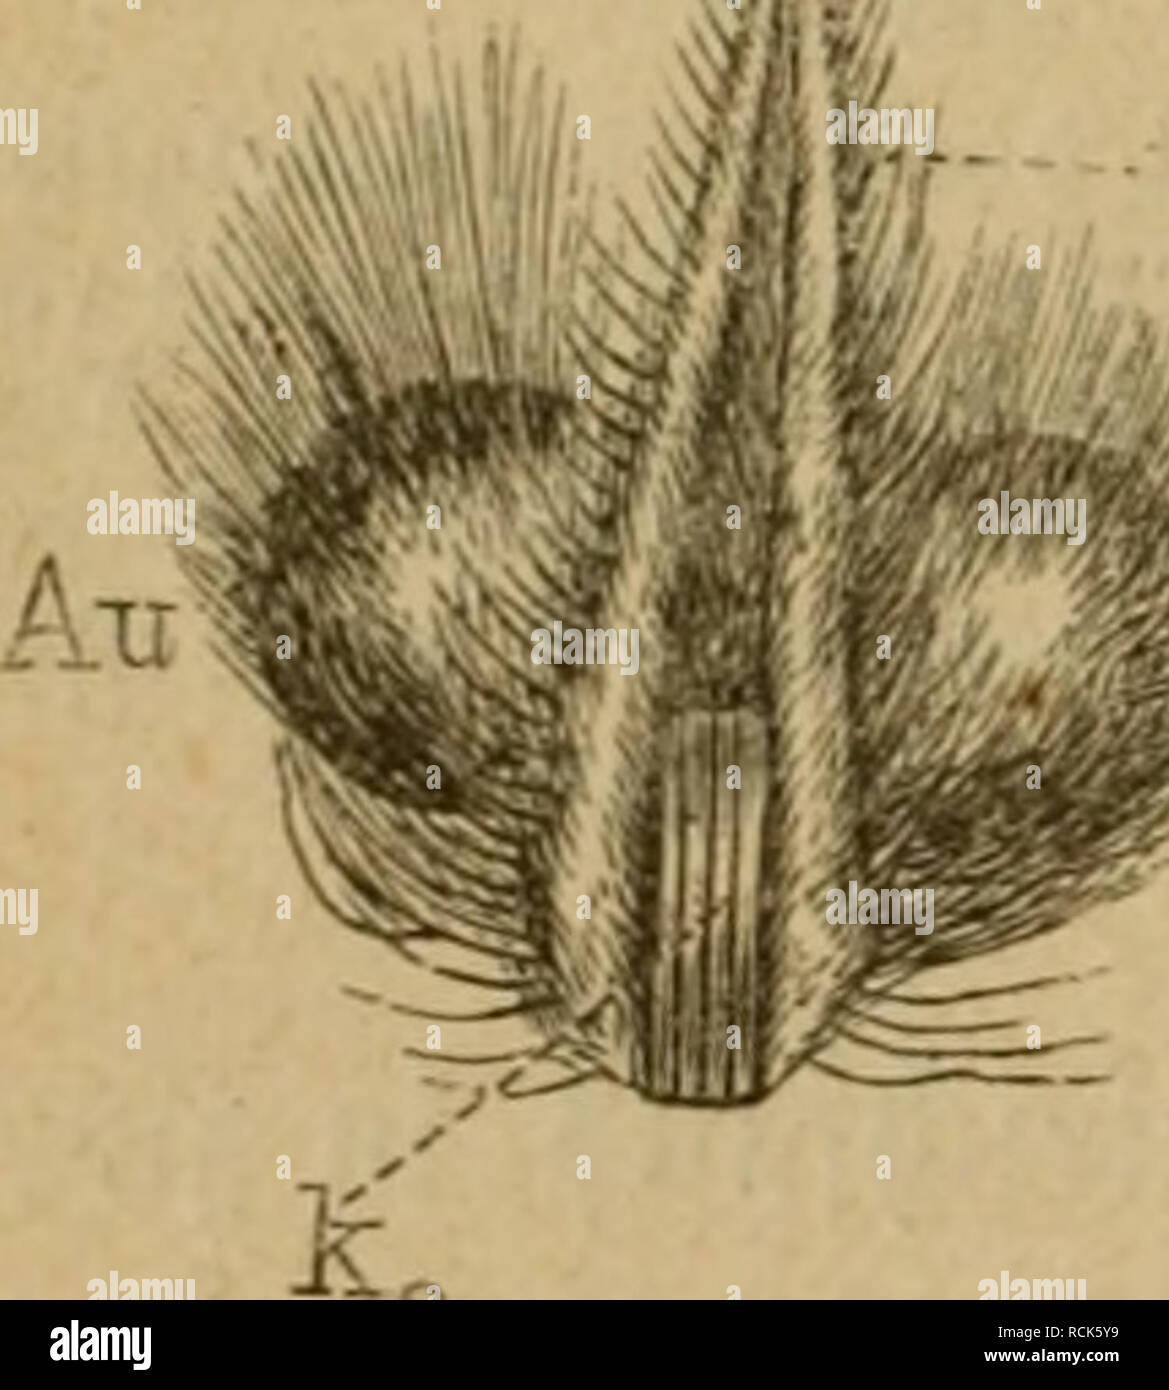 . Die Insekten. Entomology. 5i9 102. £opf fainmt Dtüffel'(ko) etnc§ galterS taa lInterU:pVentafter. 5E)ic ftaffenbe ^afi§ ber oOerftäubigcn 9^üffc(riune hcdt bie giingenförmige DOerlippe (gig. 55 u. 99 ol) §u. ^er Söaiijen^ rüffcl tritt aber nie tre^rloS auf, )üie ba§ bei beit t^üegen öftere gefc|iel)t, fonbern immer al§ ©ted^rüffel, b. ^. betüaffnet mit öier ^ieferborften (?^ig. 55 unb 99 ki, k2), Jreld^e, §. 33. bei ben 5B(attläufen, ben Ütüffet, ja -im au§geftrerften ^iiftanb fetbft ben gangen Körper tüeit überragen unb be^^alb in eine @d^(inge um- biegen. ^ie öößige Sbentität mit bem S)ipt - Stock Image